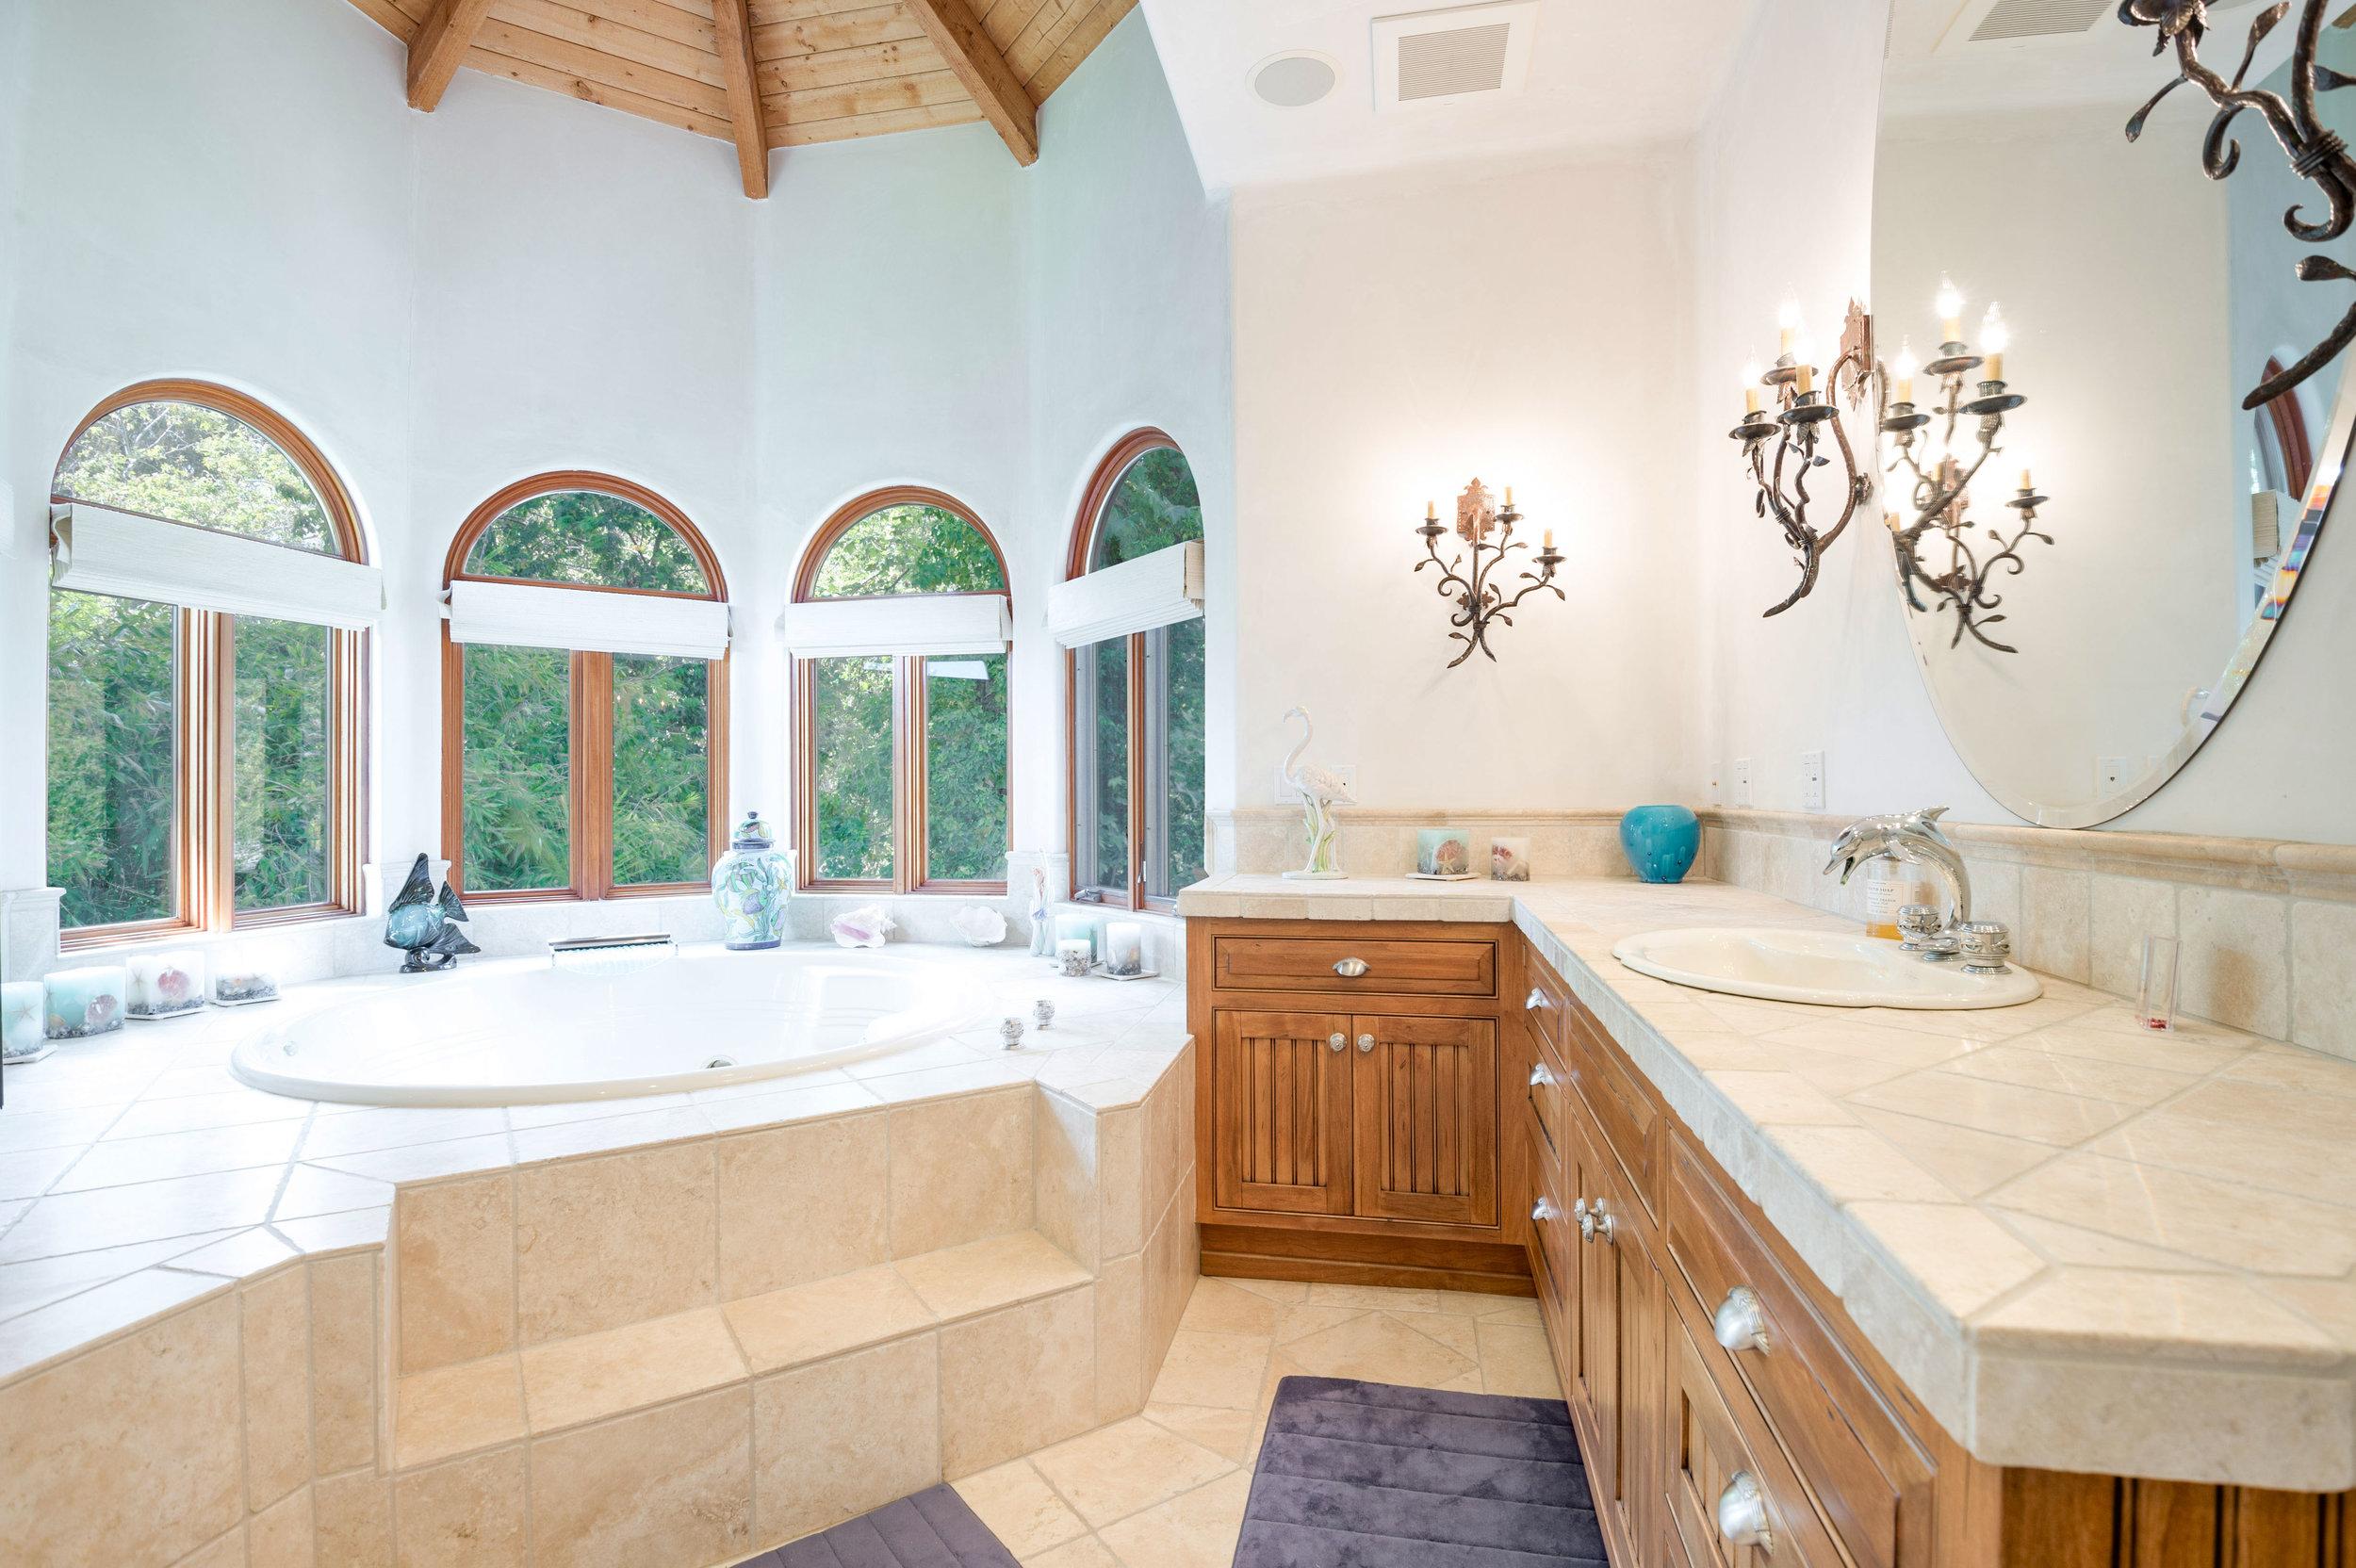 015 master bathroom 6405 bonsall Malibu For Sale The Malibu Life Team Luxury Real Estate.jpg